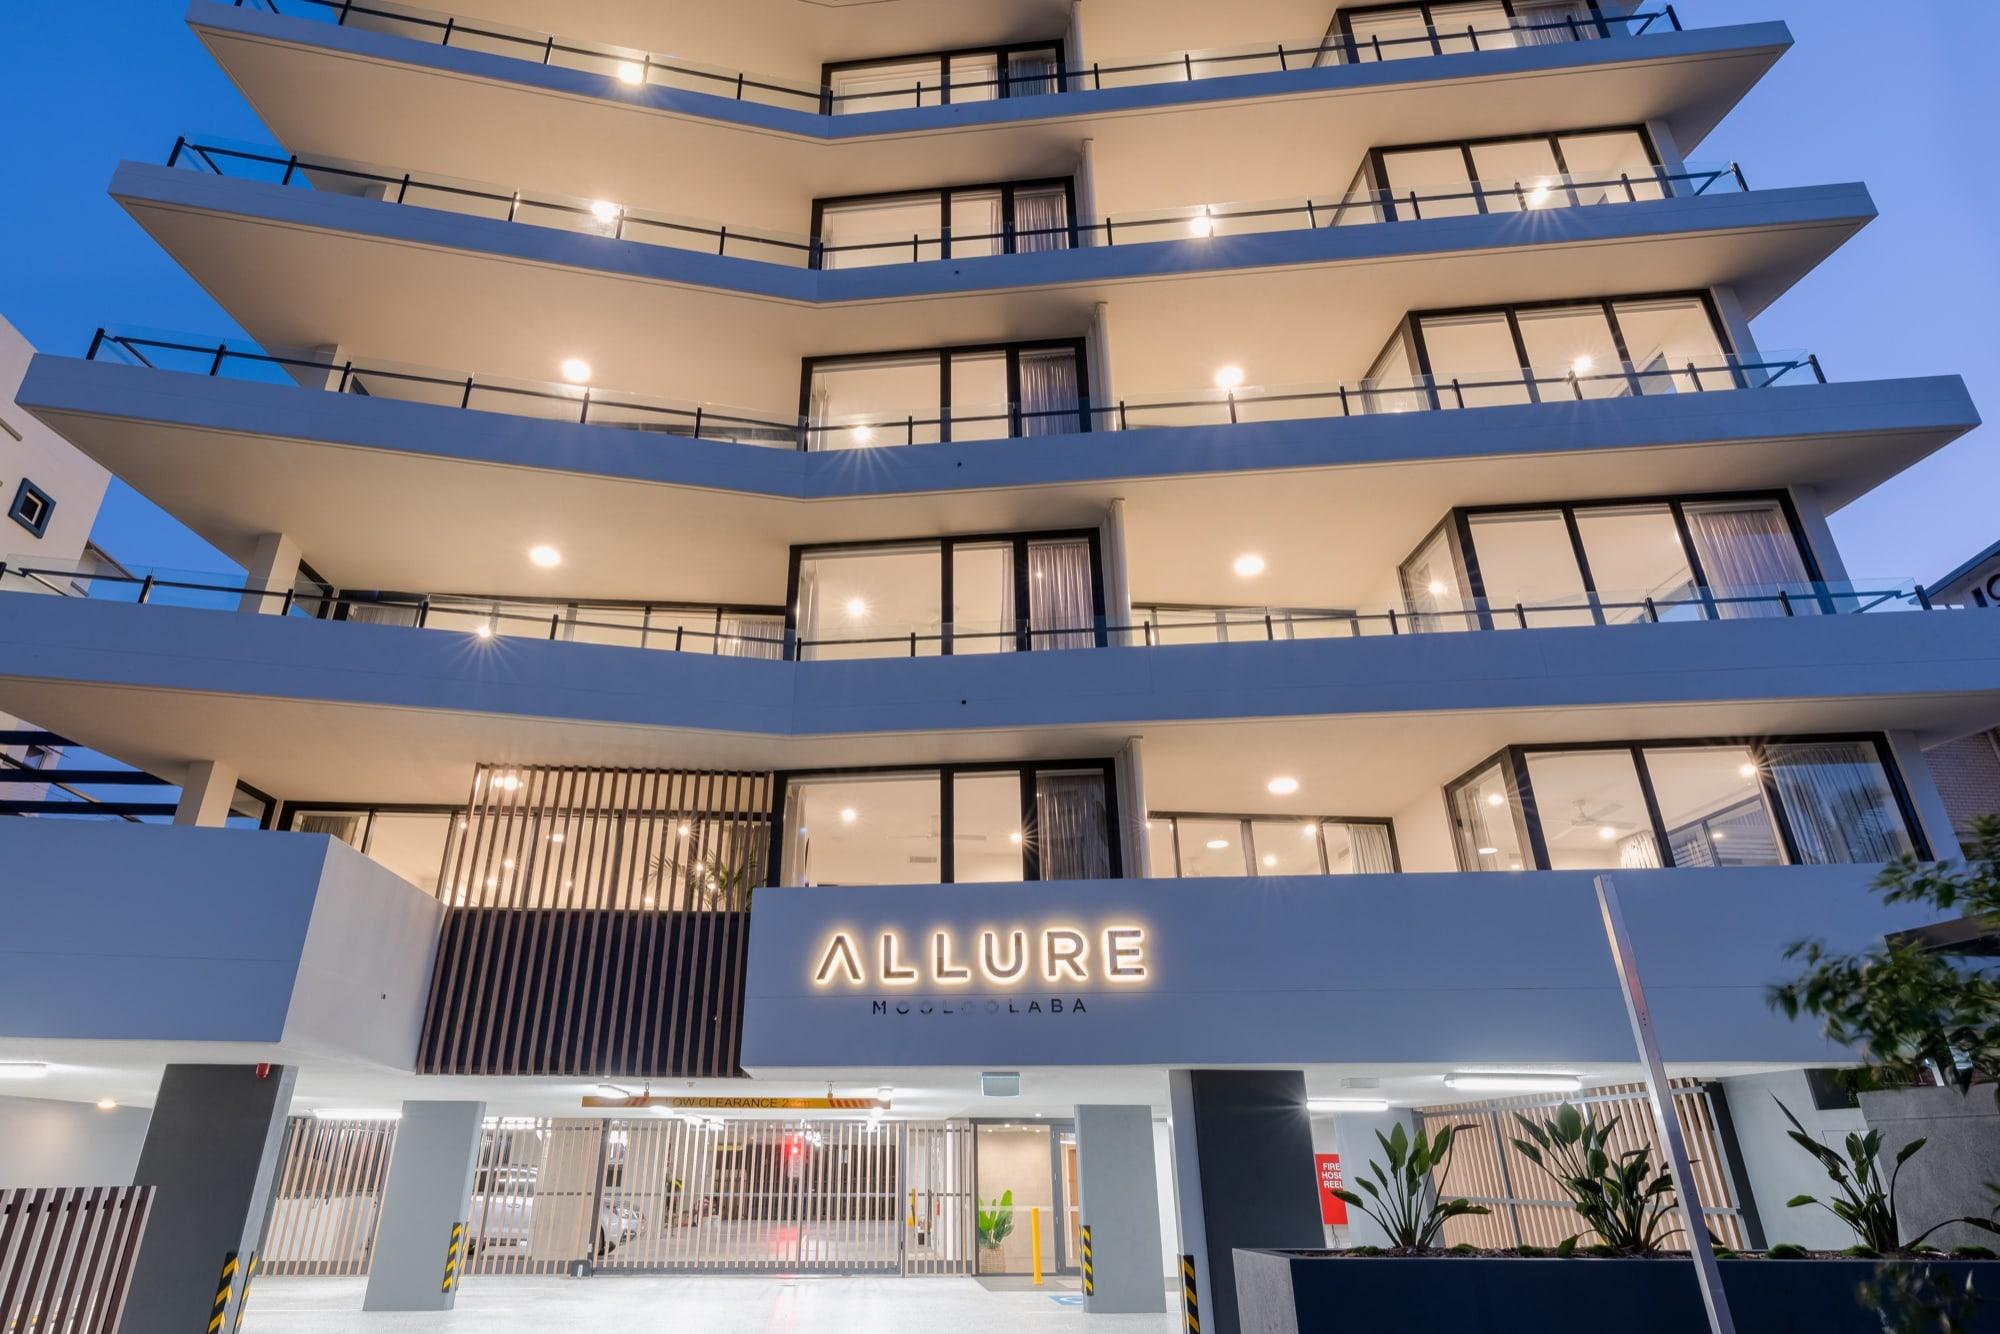 allure-mooloolaba-facilities-7